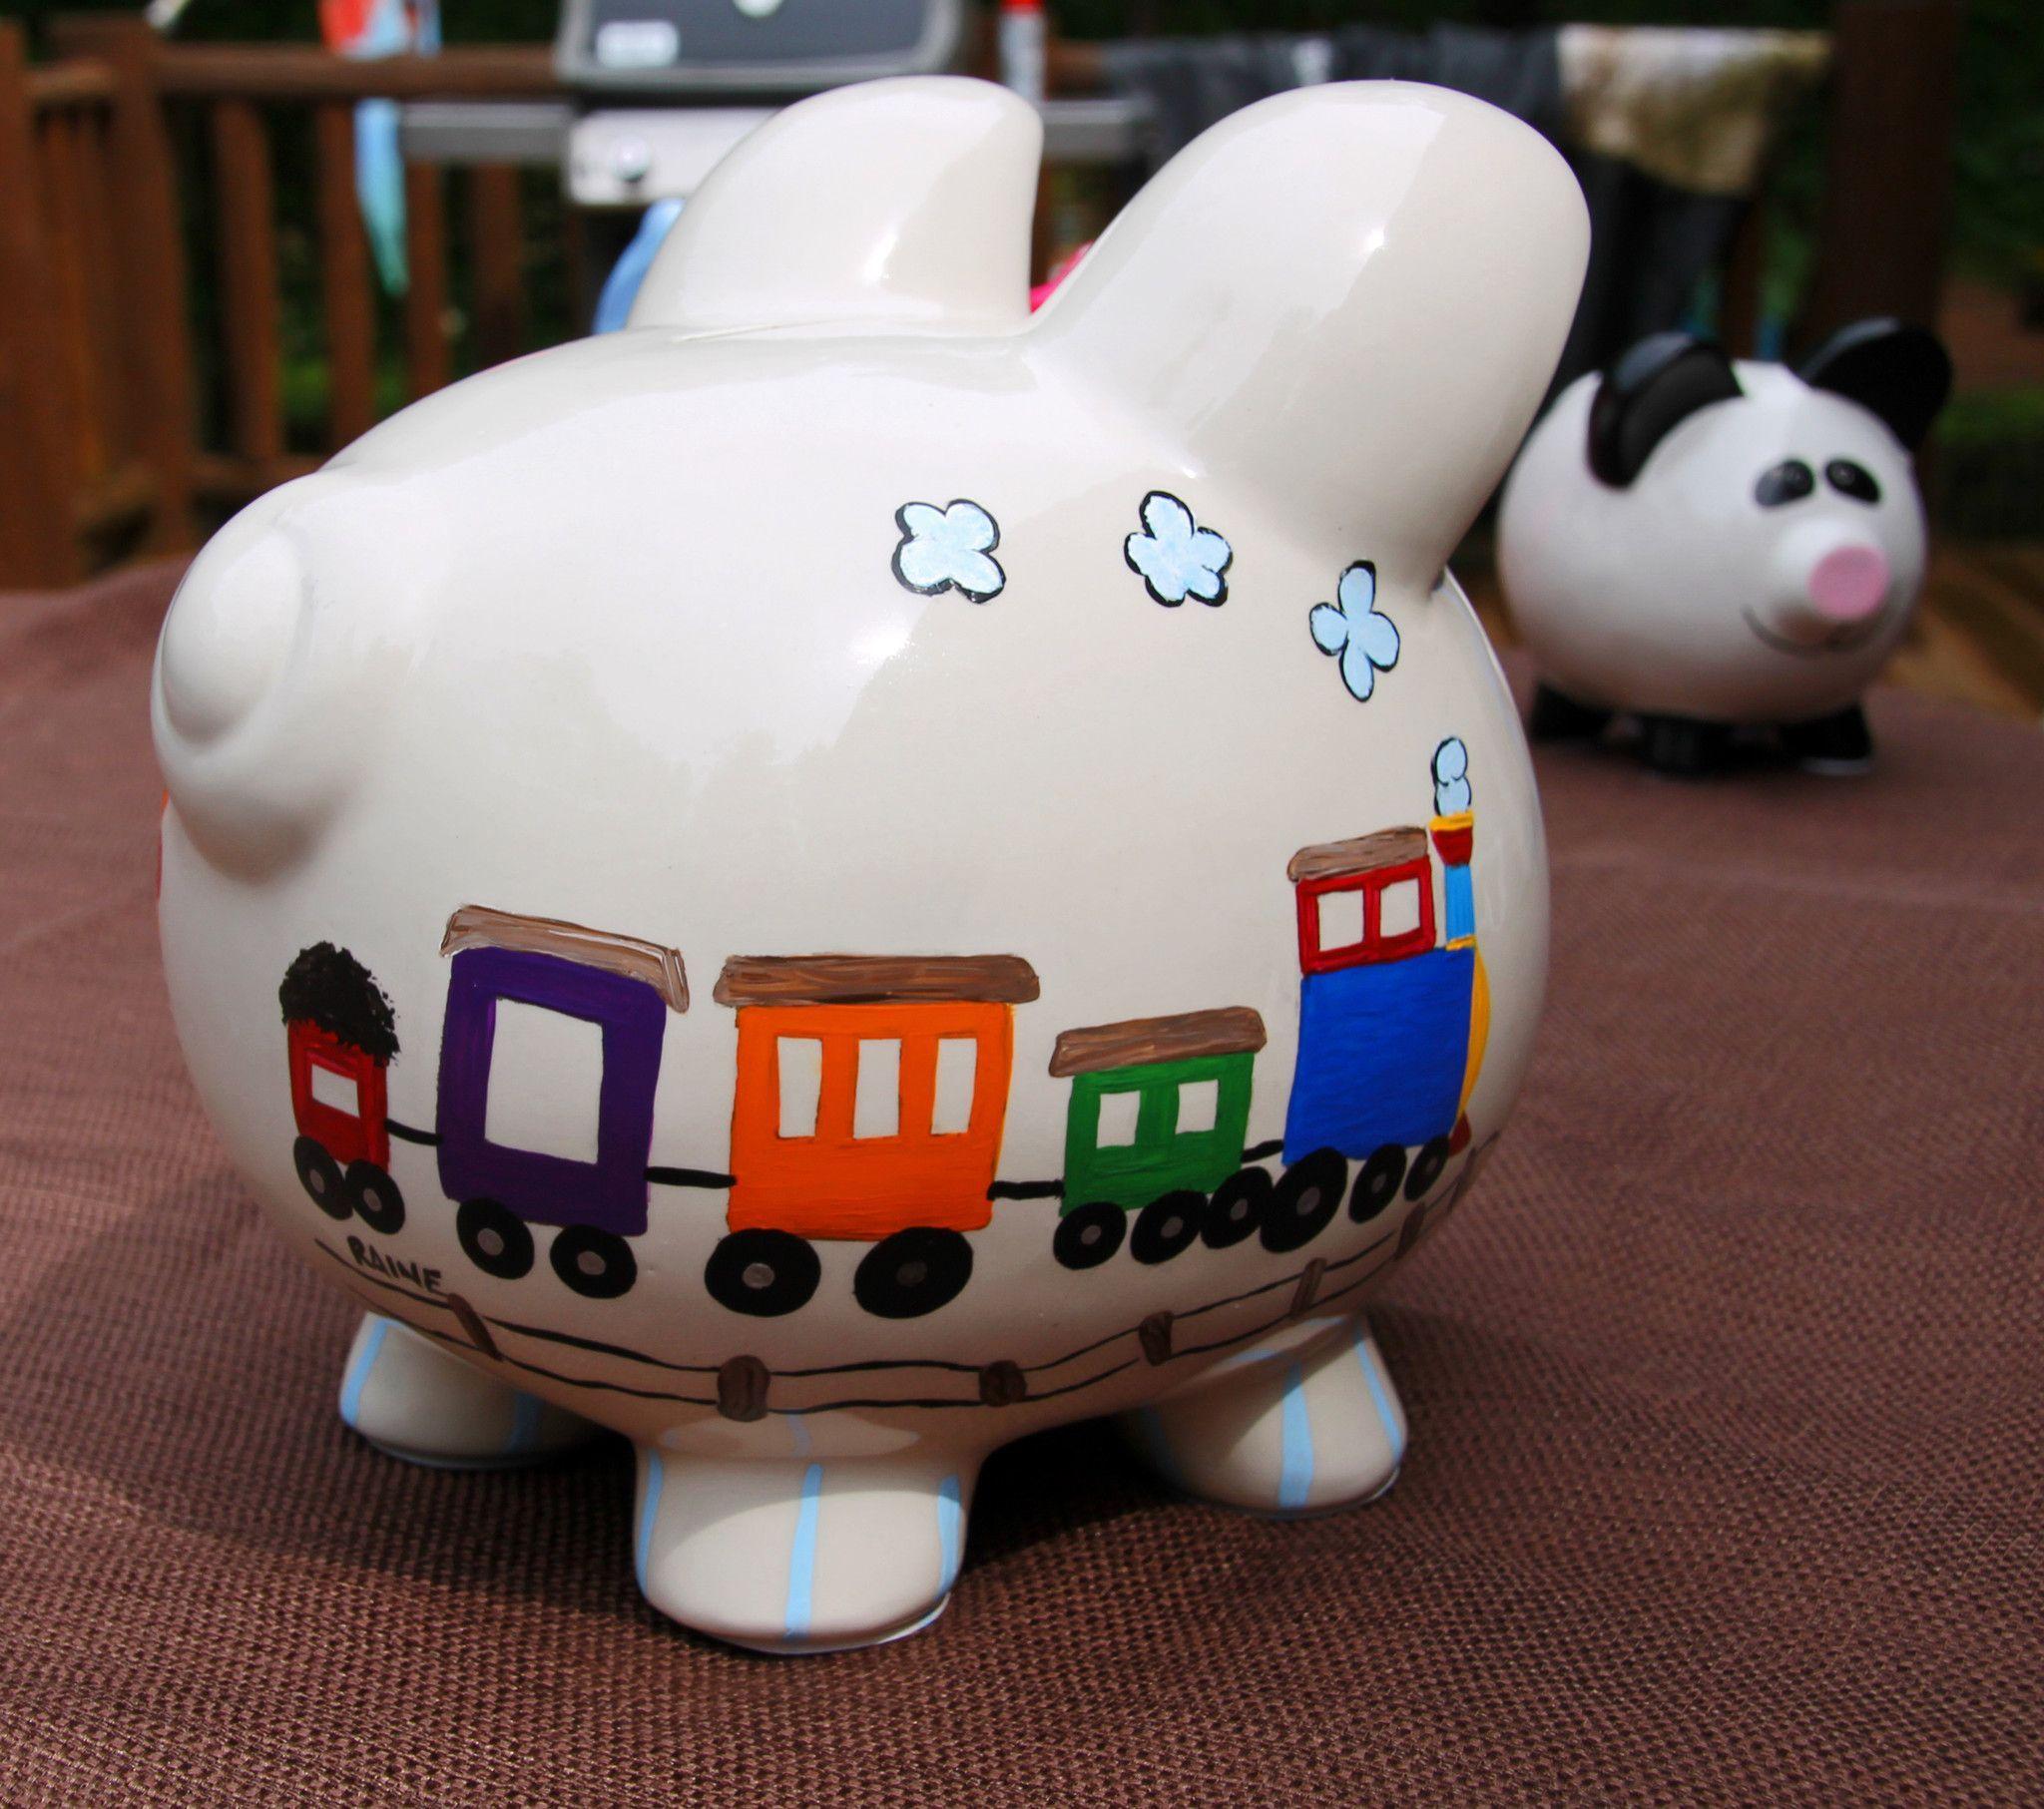 choo choo trainairplane piggy bank  taylor  pinterest  trains  - choo choo trainairplane piggy bank